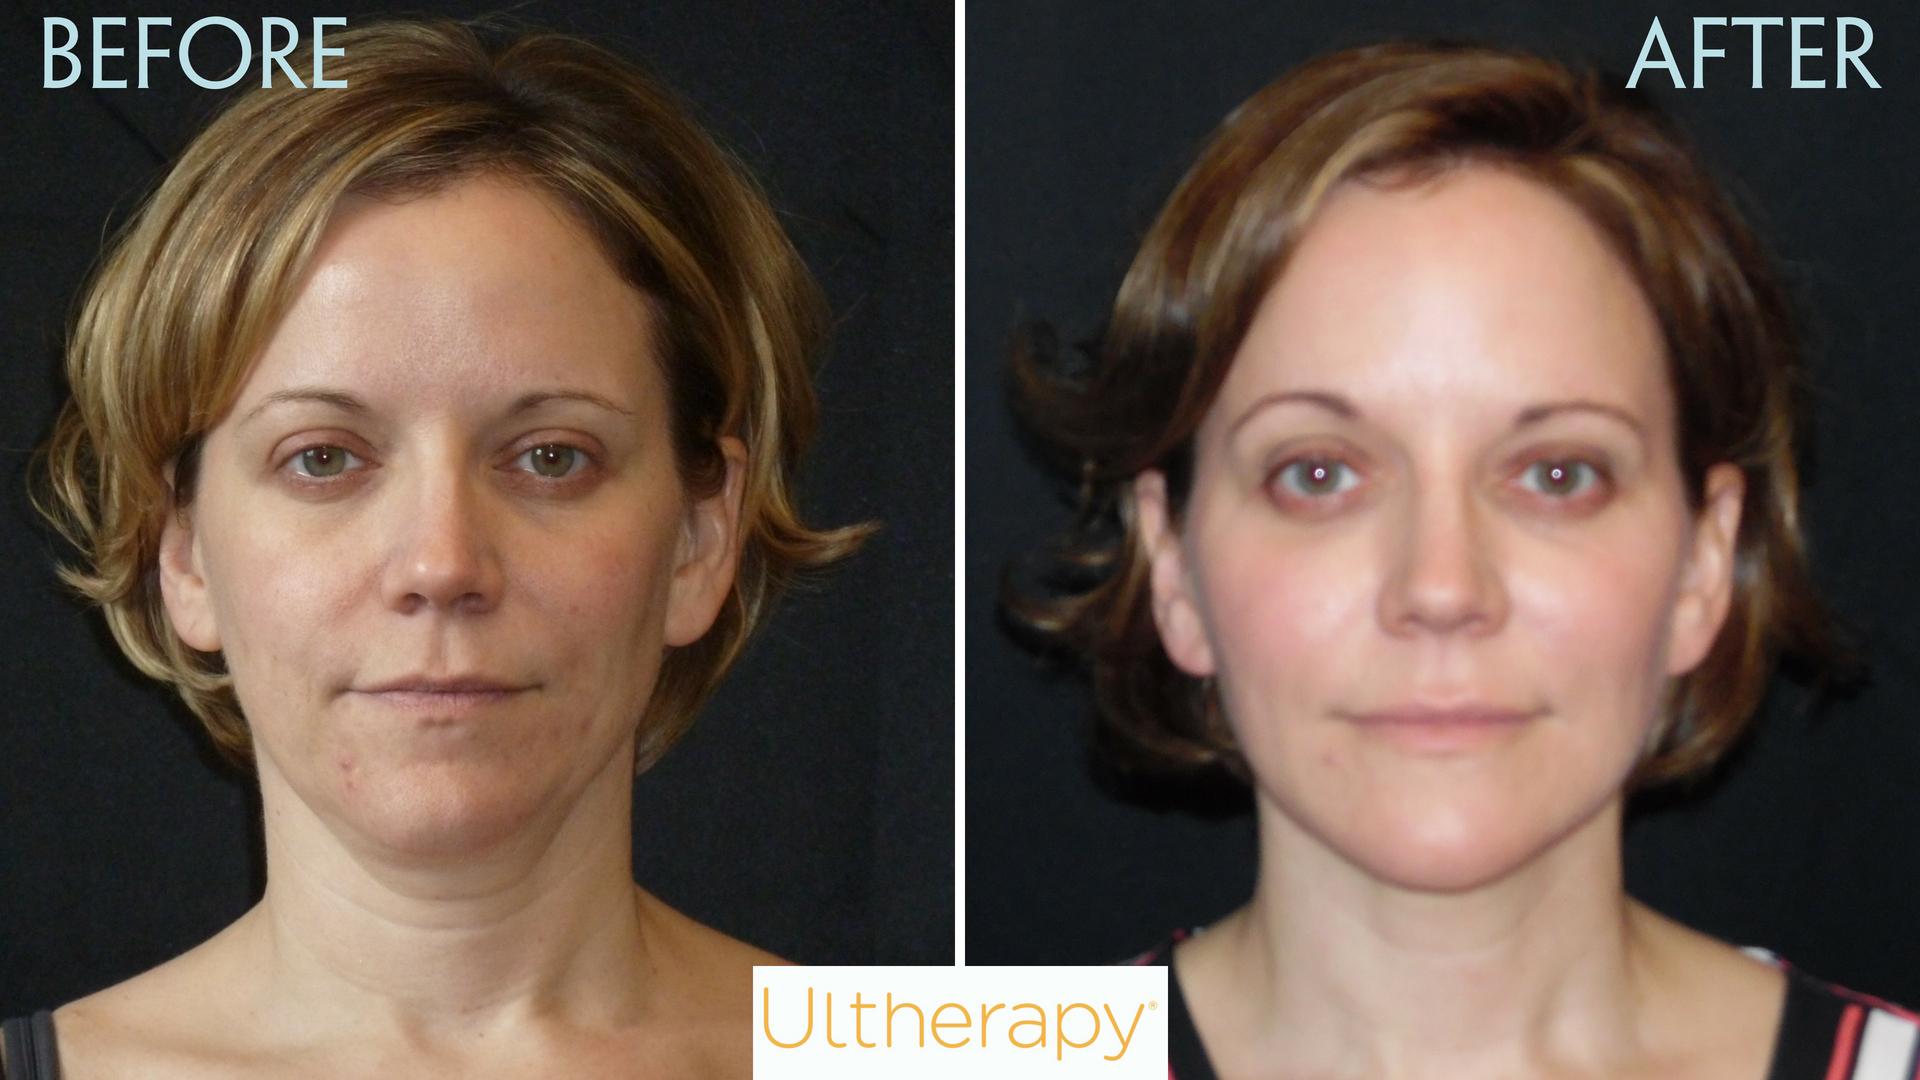 Ultherapy - Lift And Tighten Skin   Senara Health And Healing Center